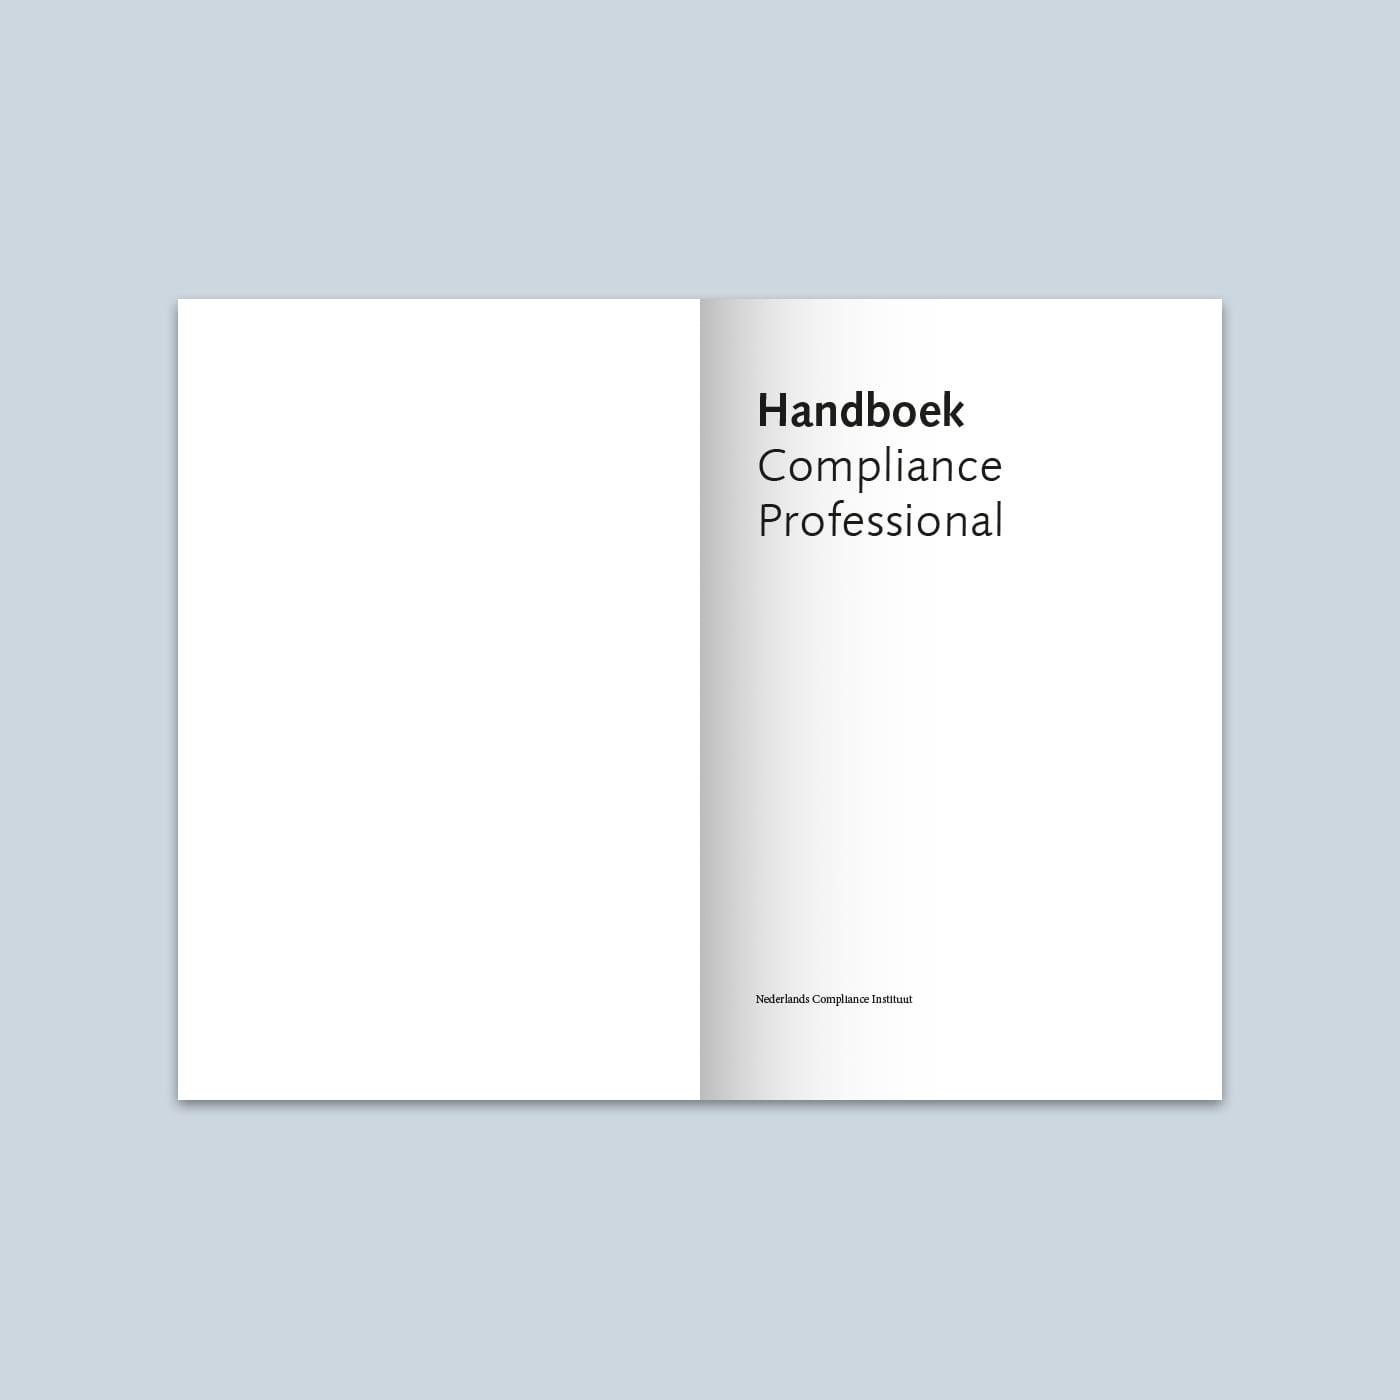 Handboek Compliance Professional 2011 binnenwerk